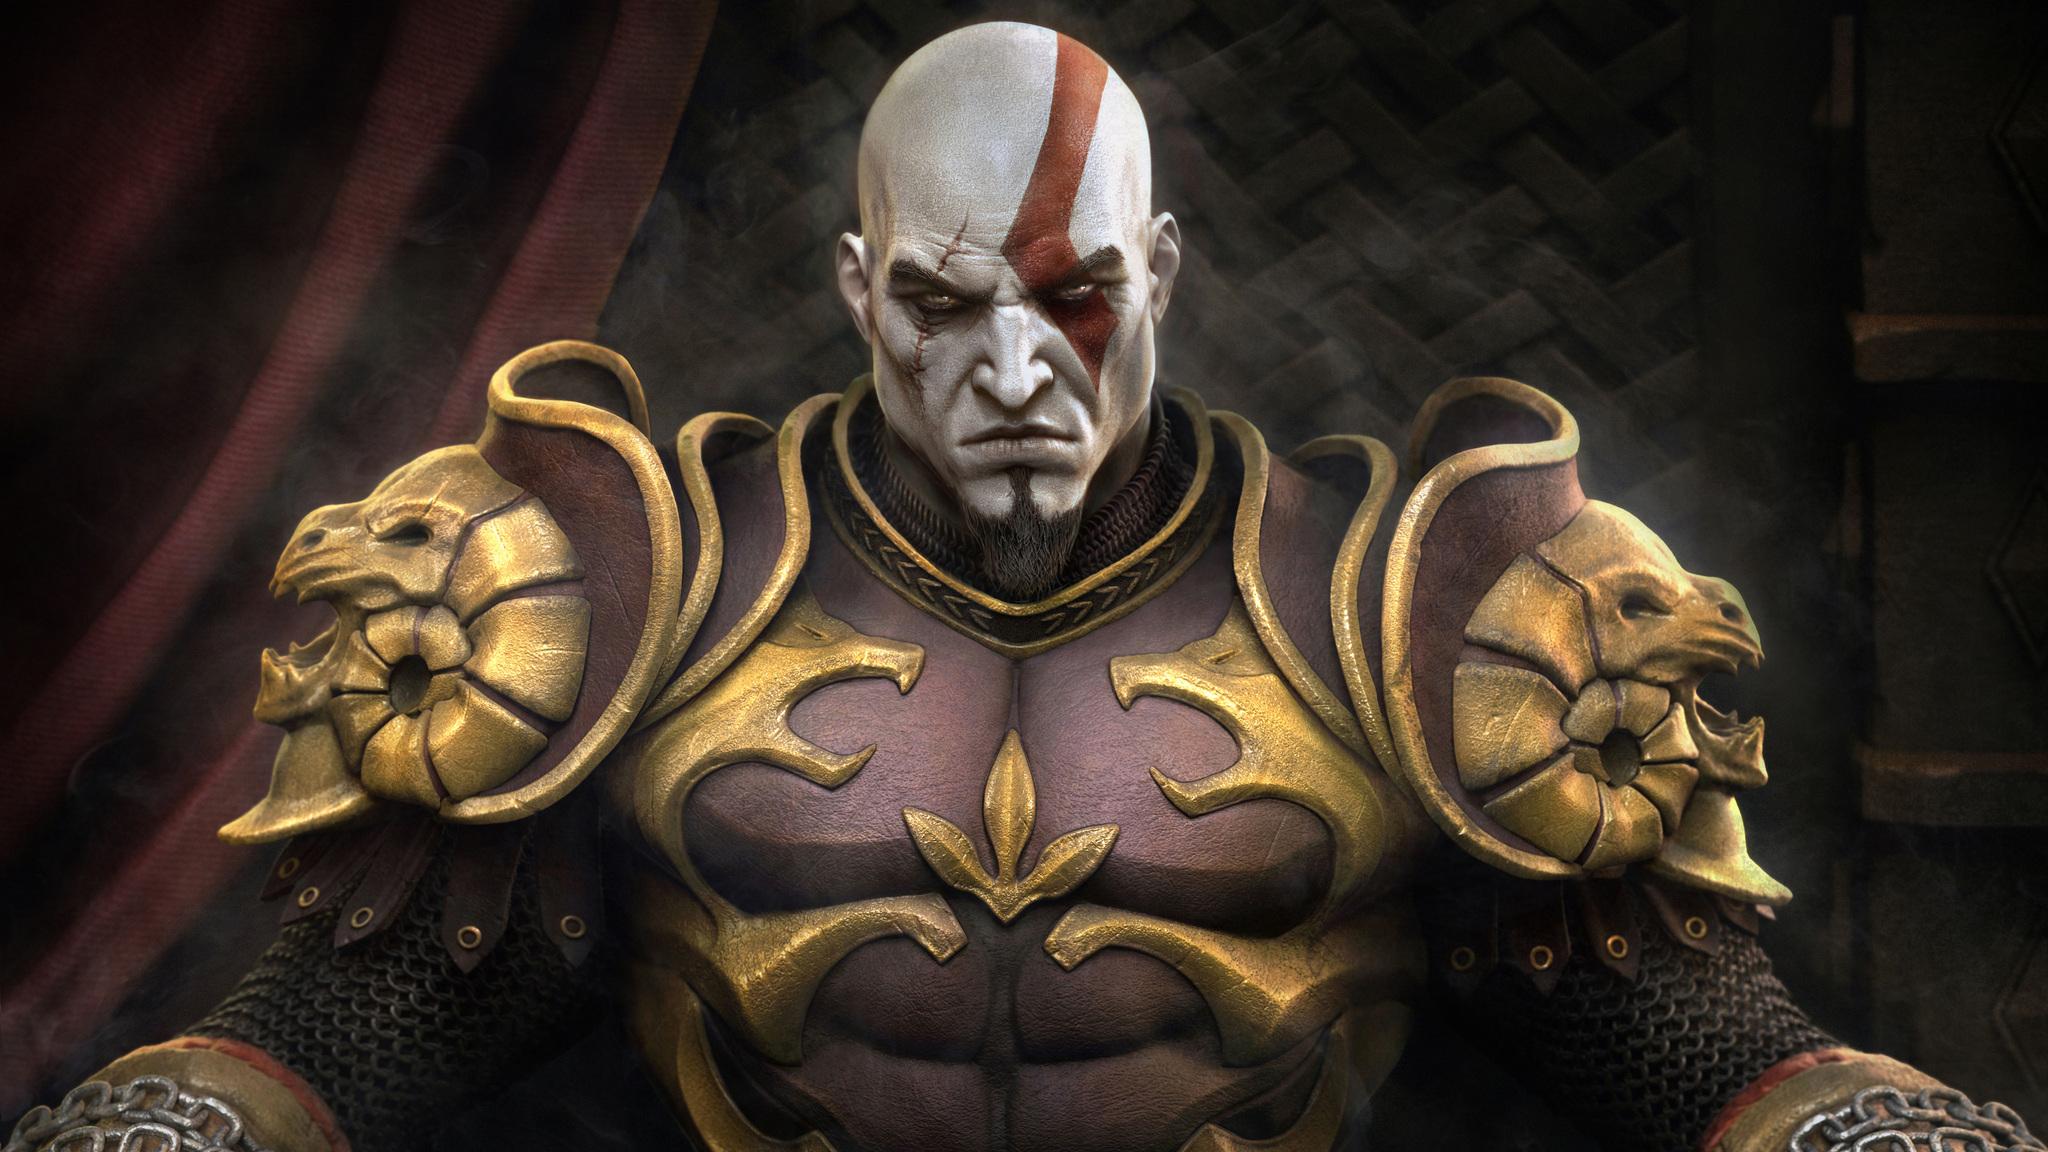 kratos-throne-god-of-war-fh.jpg